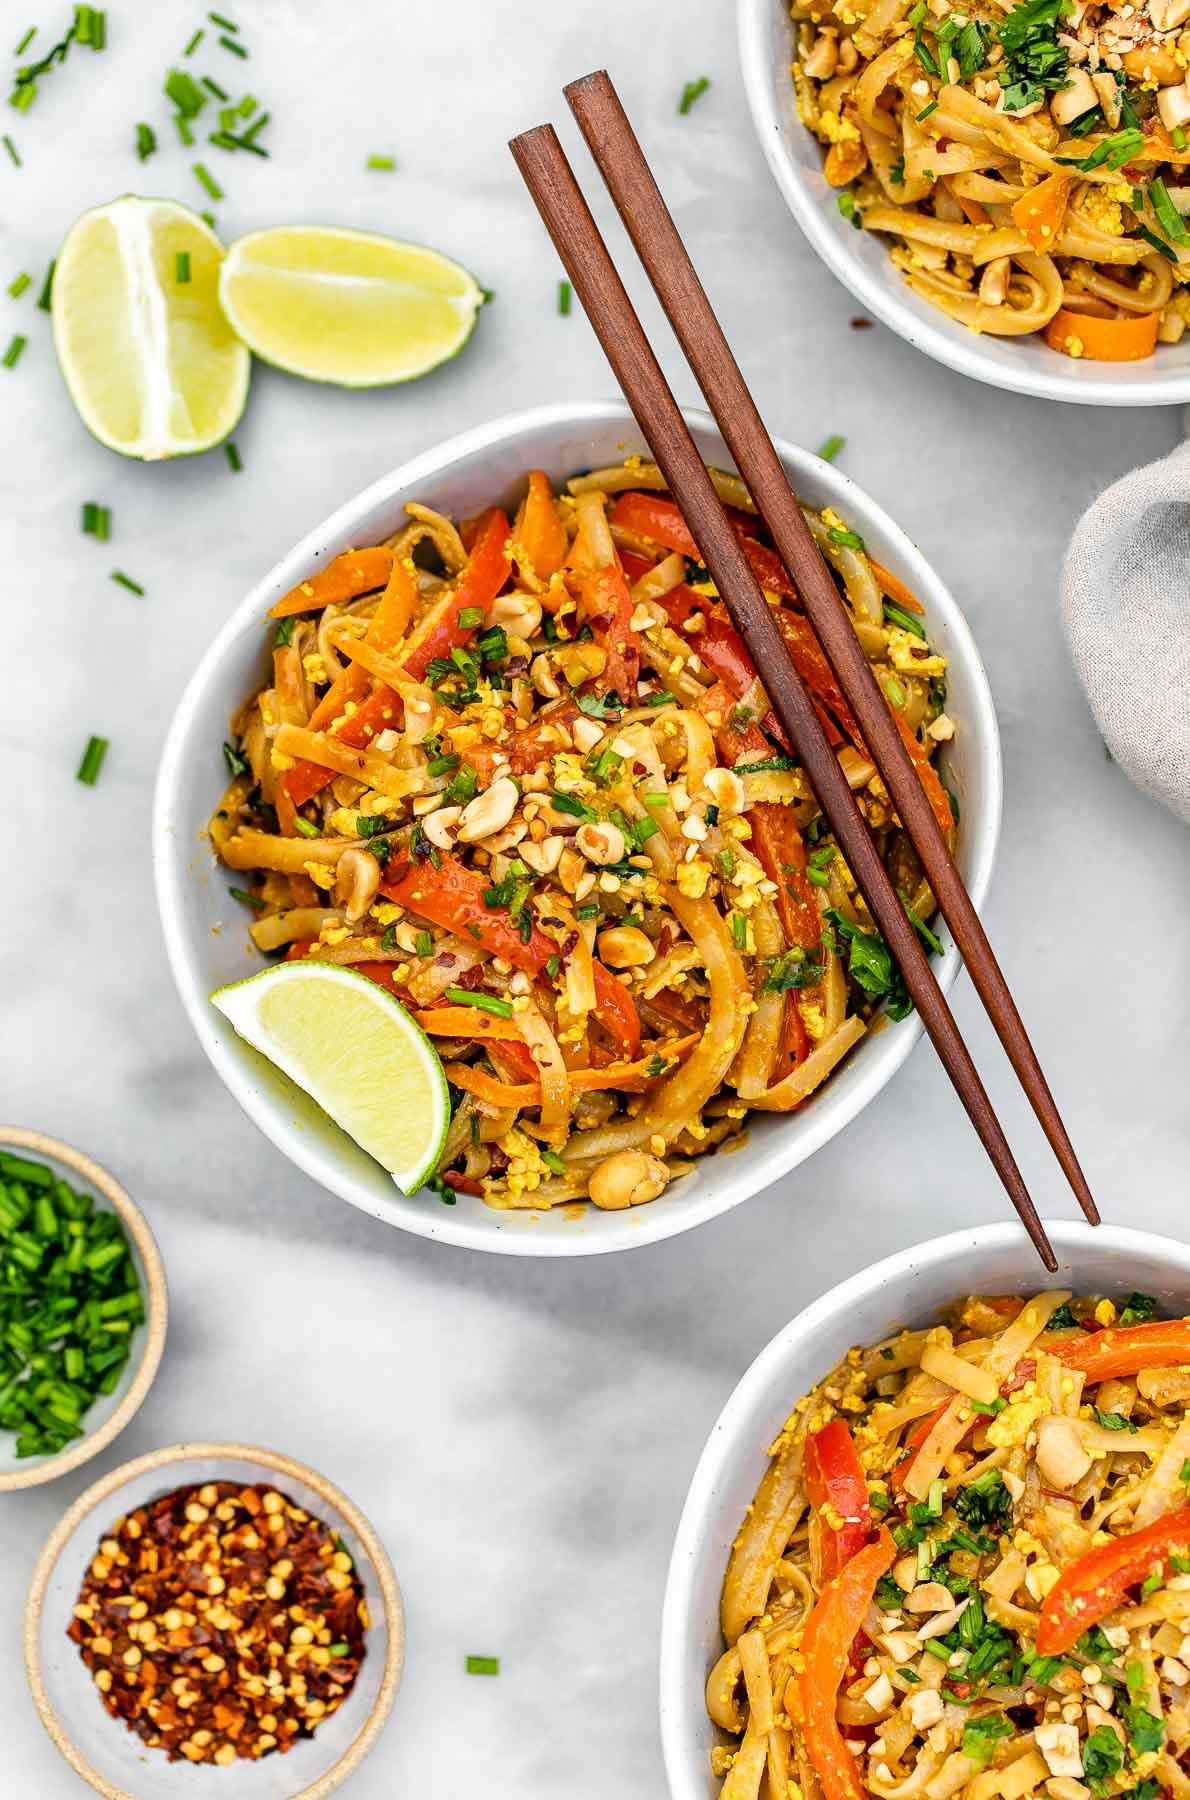 Vegan pad thai in three bowls with chopsticks on top.